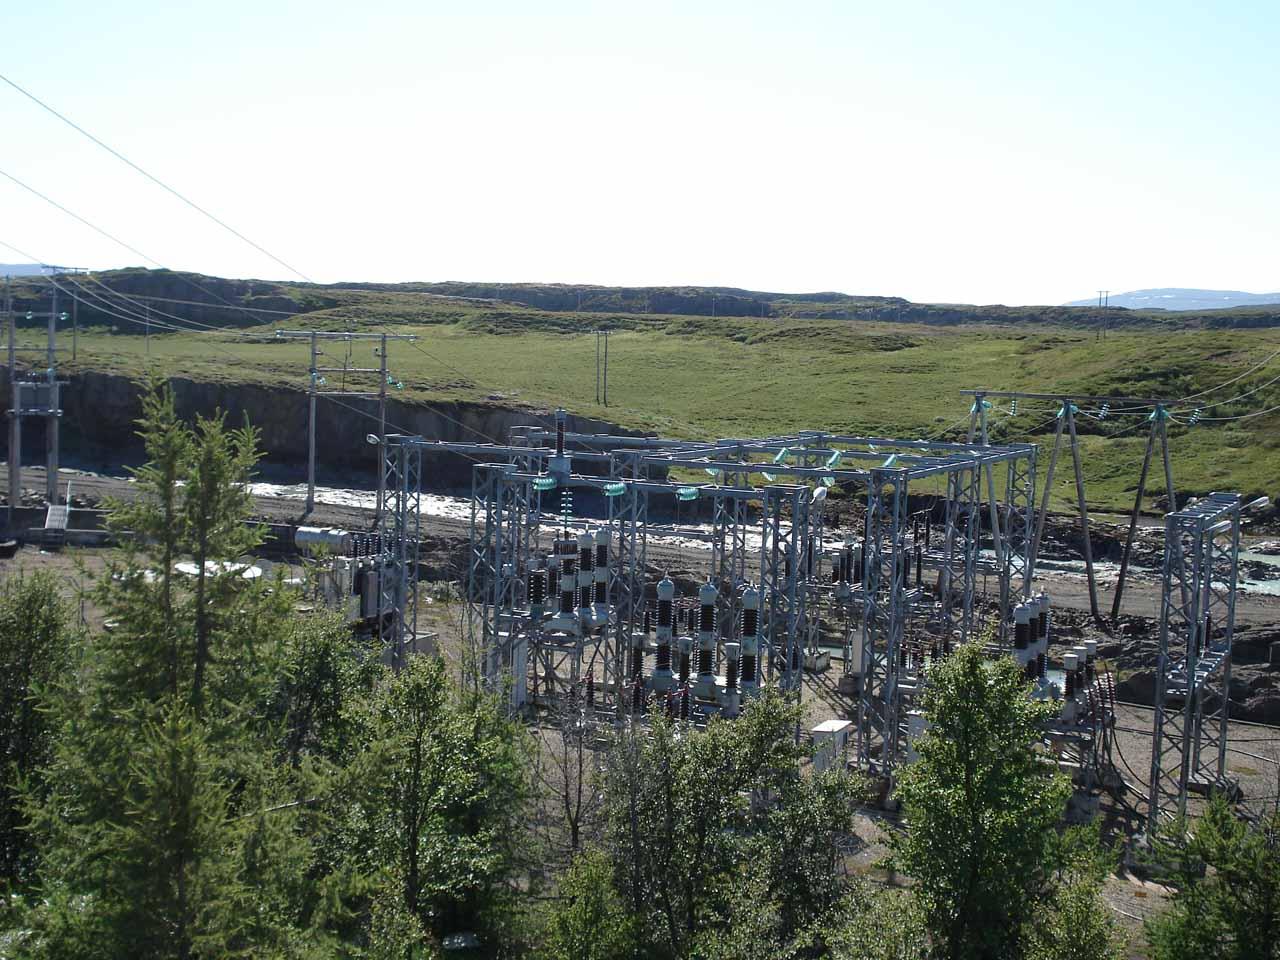 Looking towards the transformers at the Lagarfoss facility